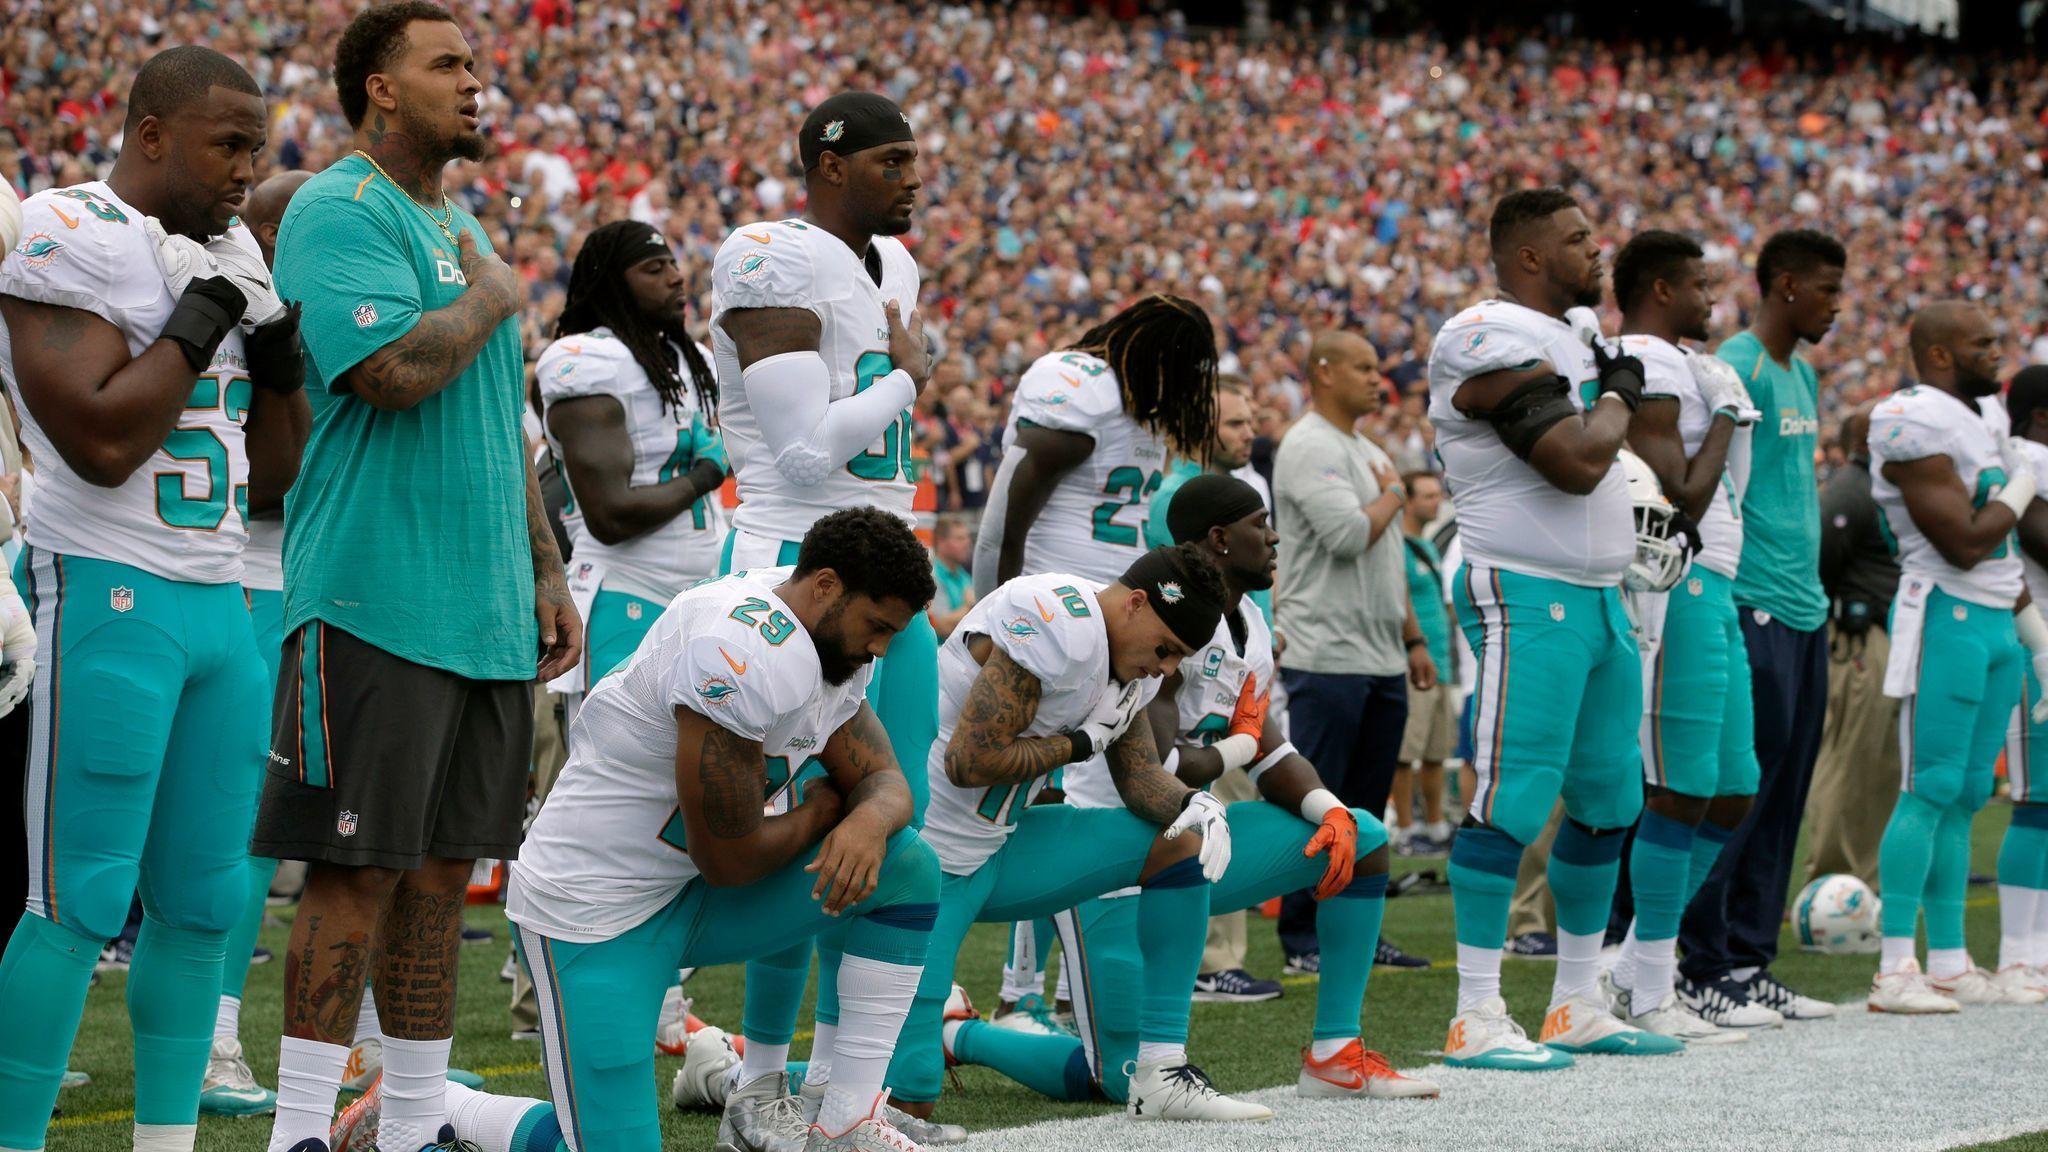 Fl-sp-dolphins-kenny-stills-anthem-protest-20170524